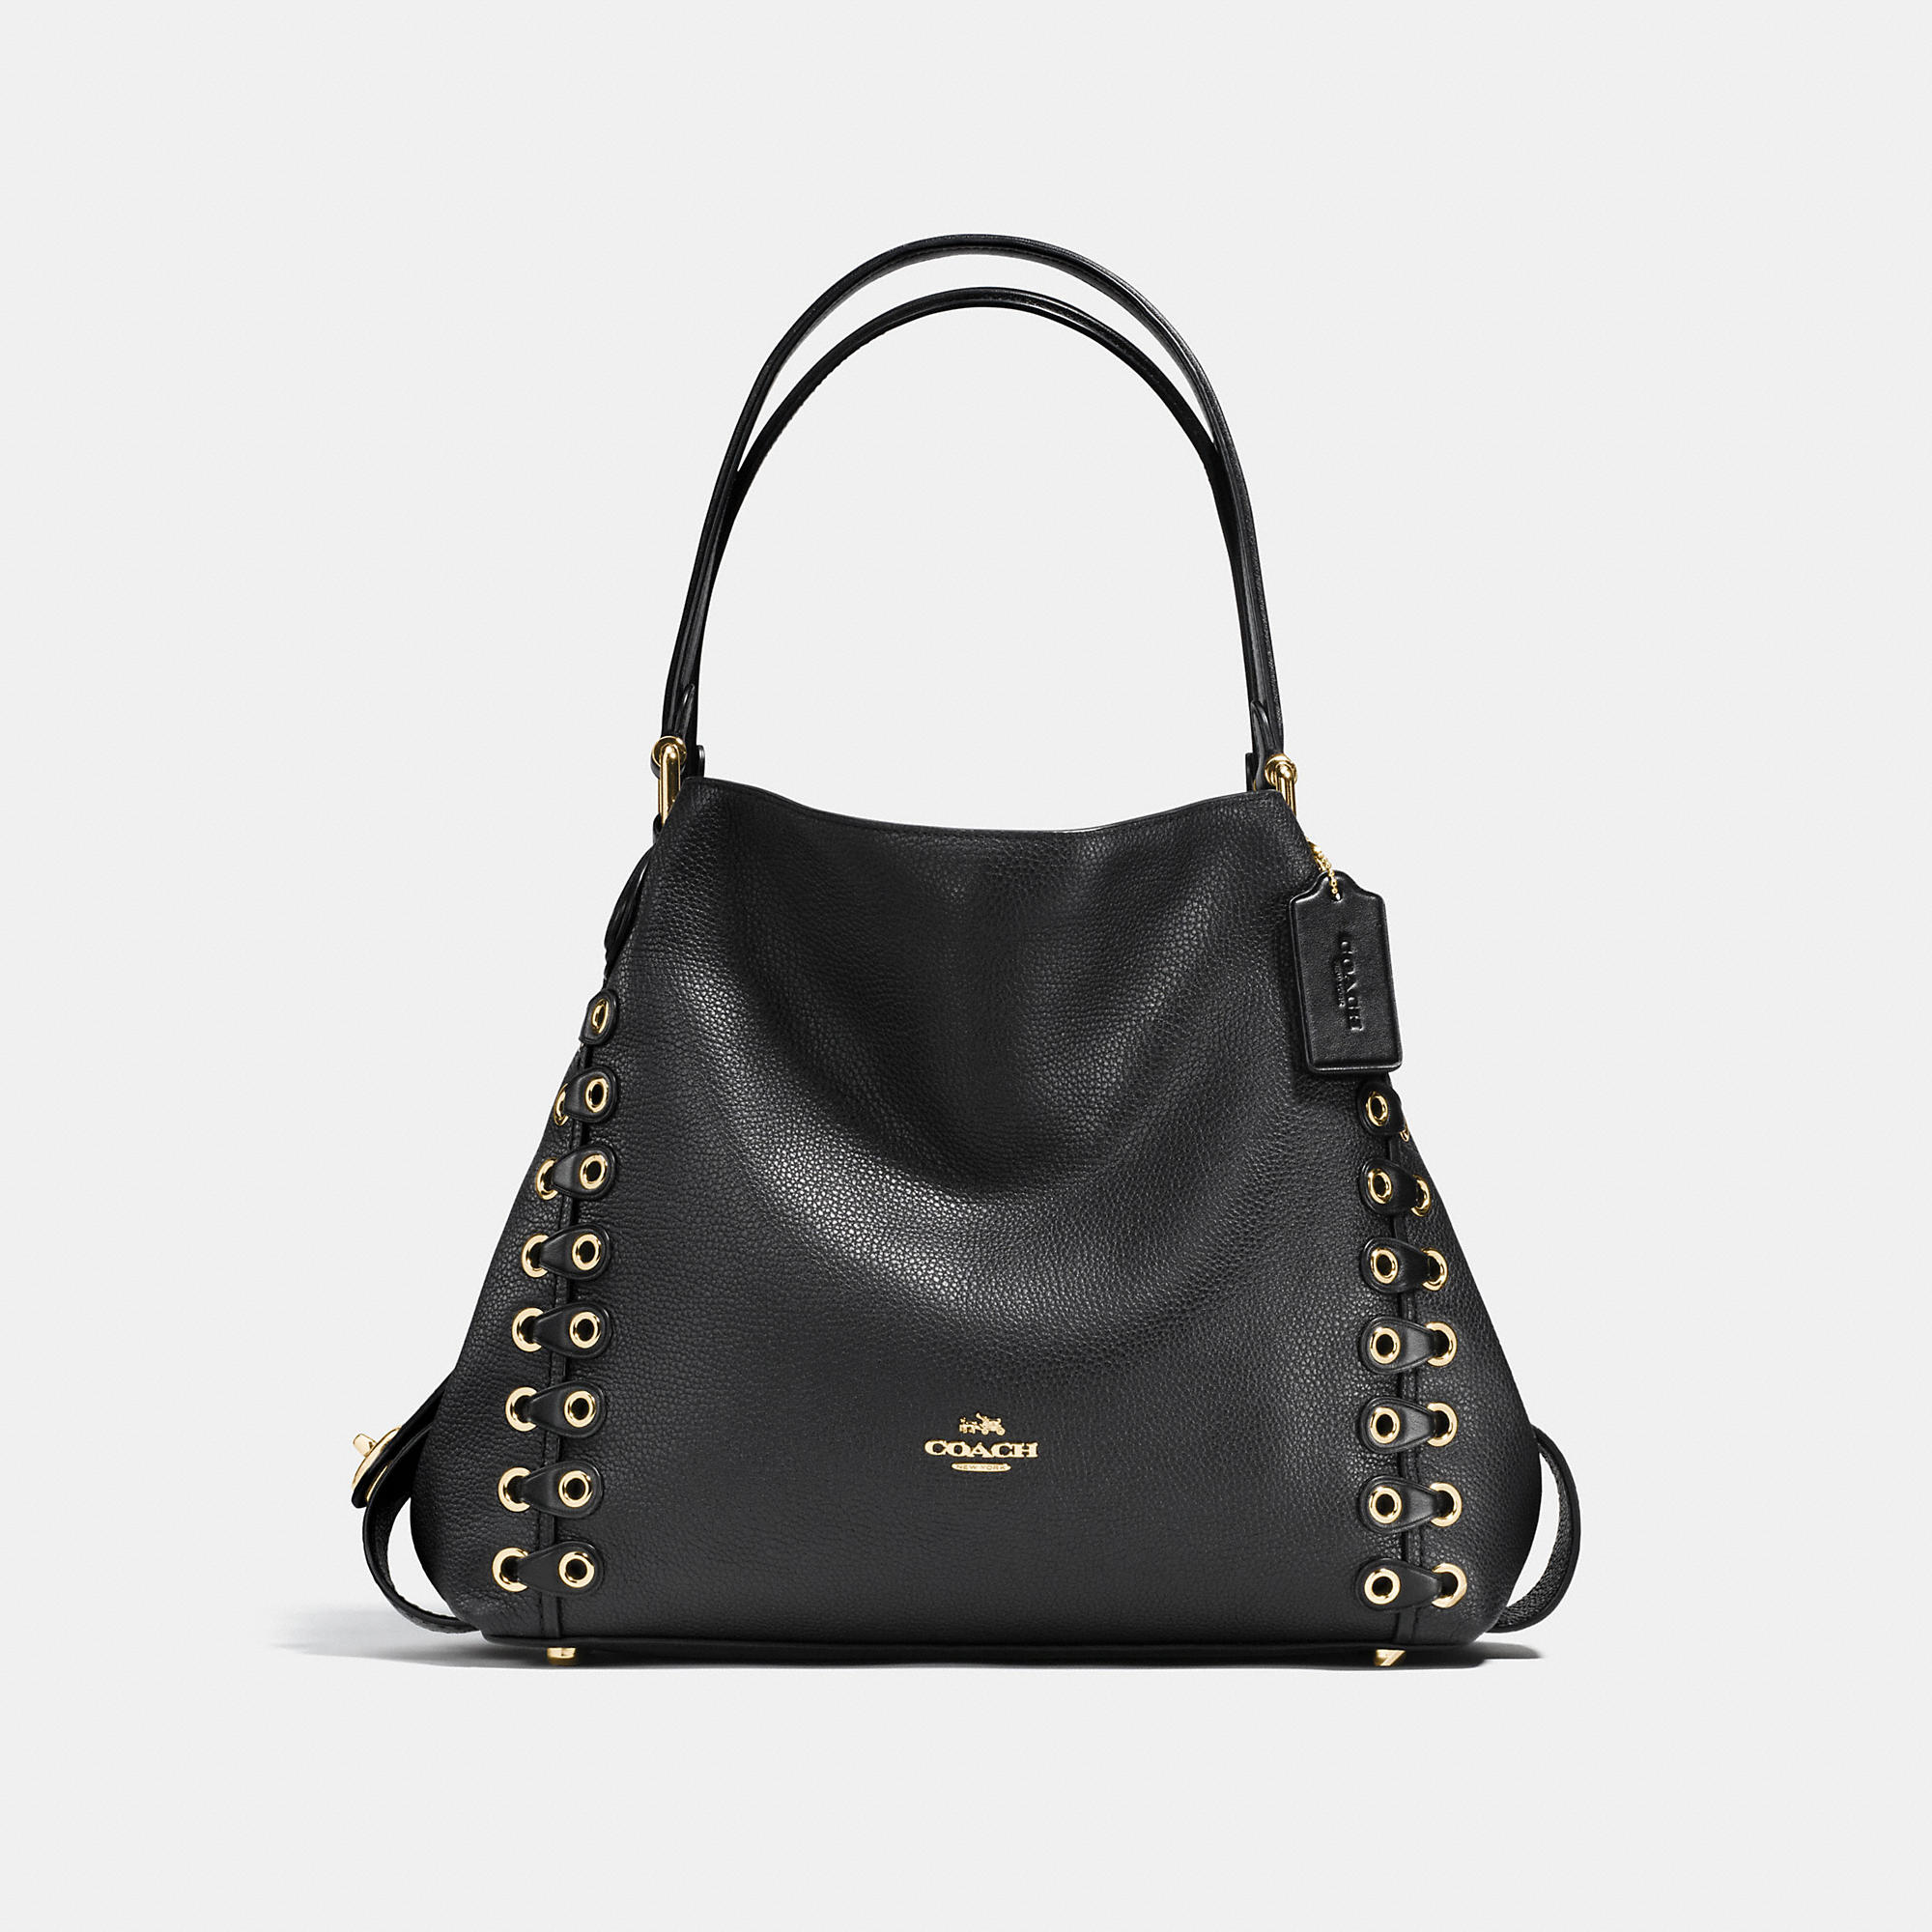 8cdd0e7c10 Statement Bags - Handbags for Women